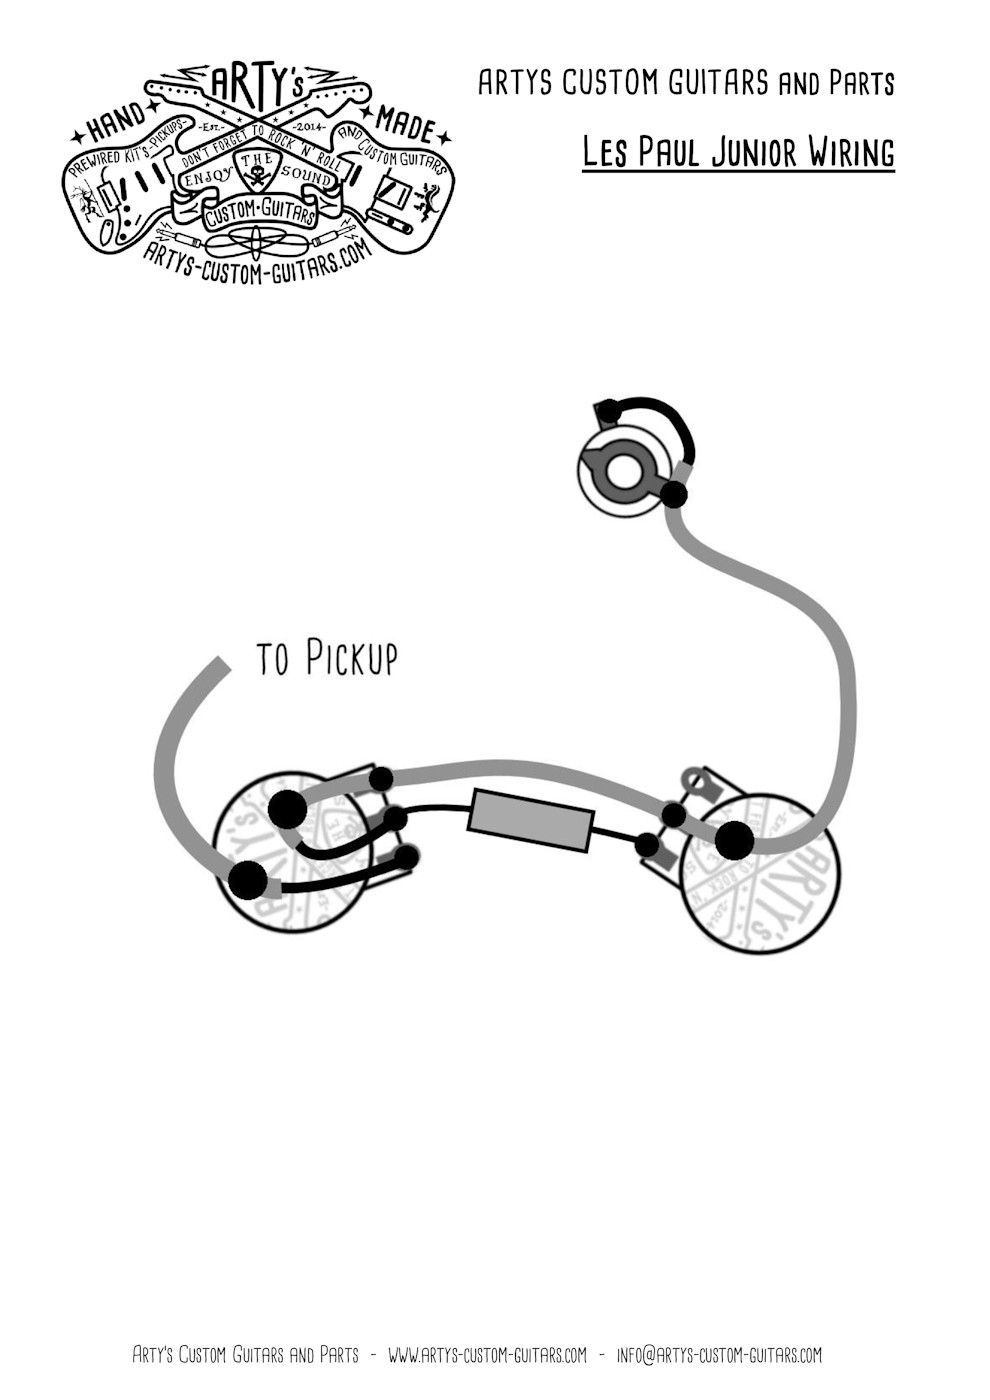 arty s custom guitars wiring diagram plan les paul junior assembly harness [ 990 x 1400 Pixel ]